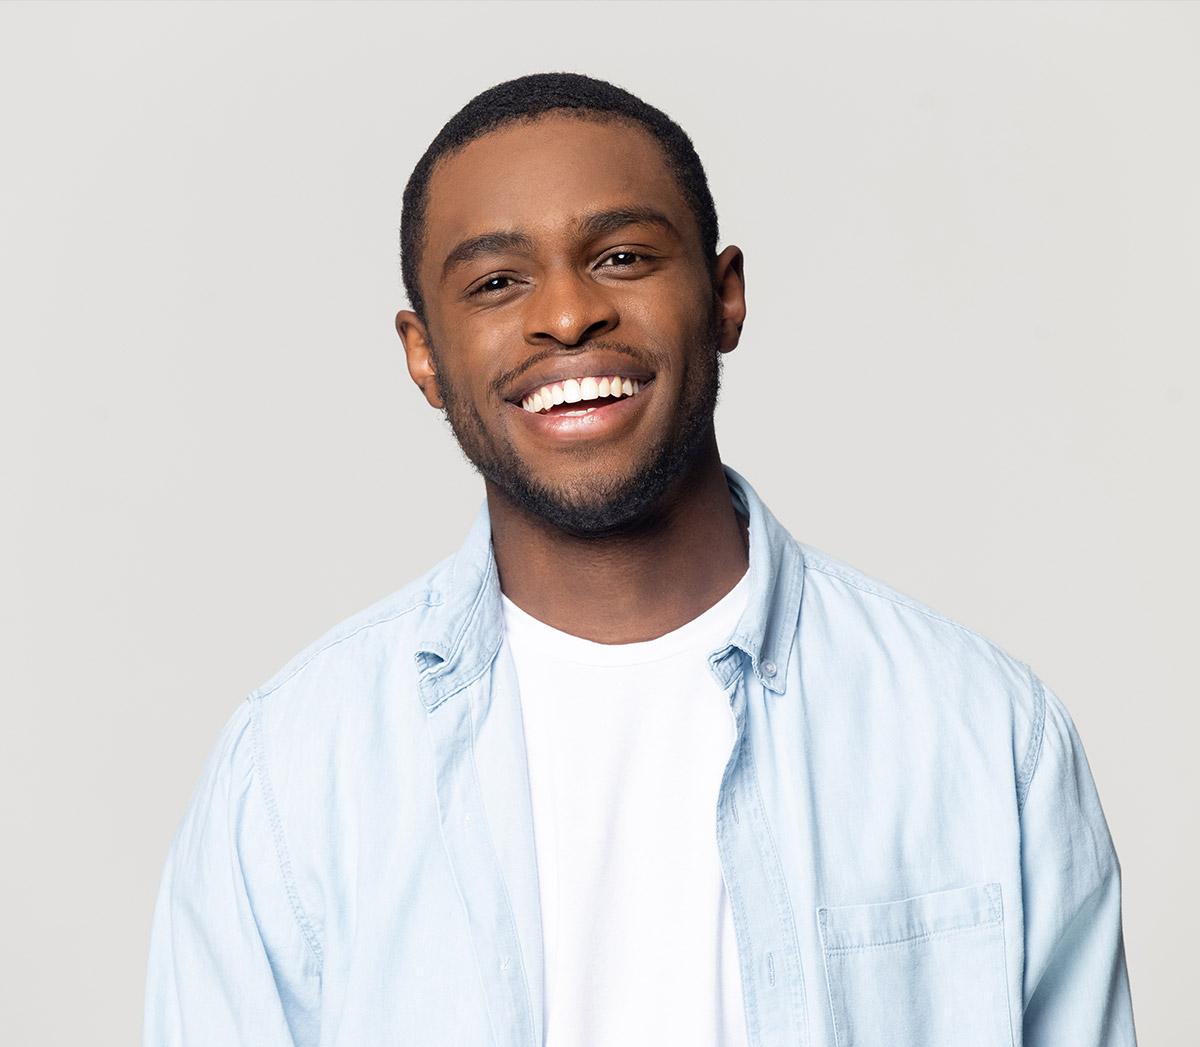 https://flossandsmile.co.uk/wp-content/uploads/2021/01/Floss-and-Smile-06.jpg